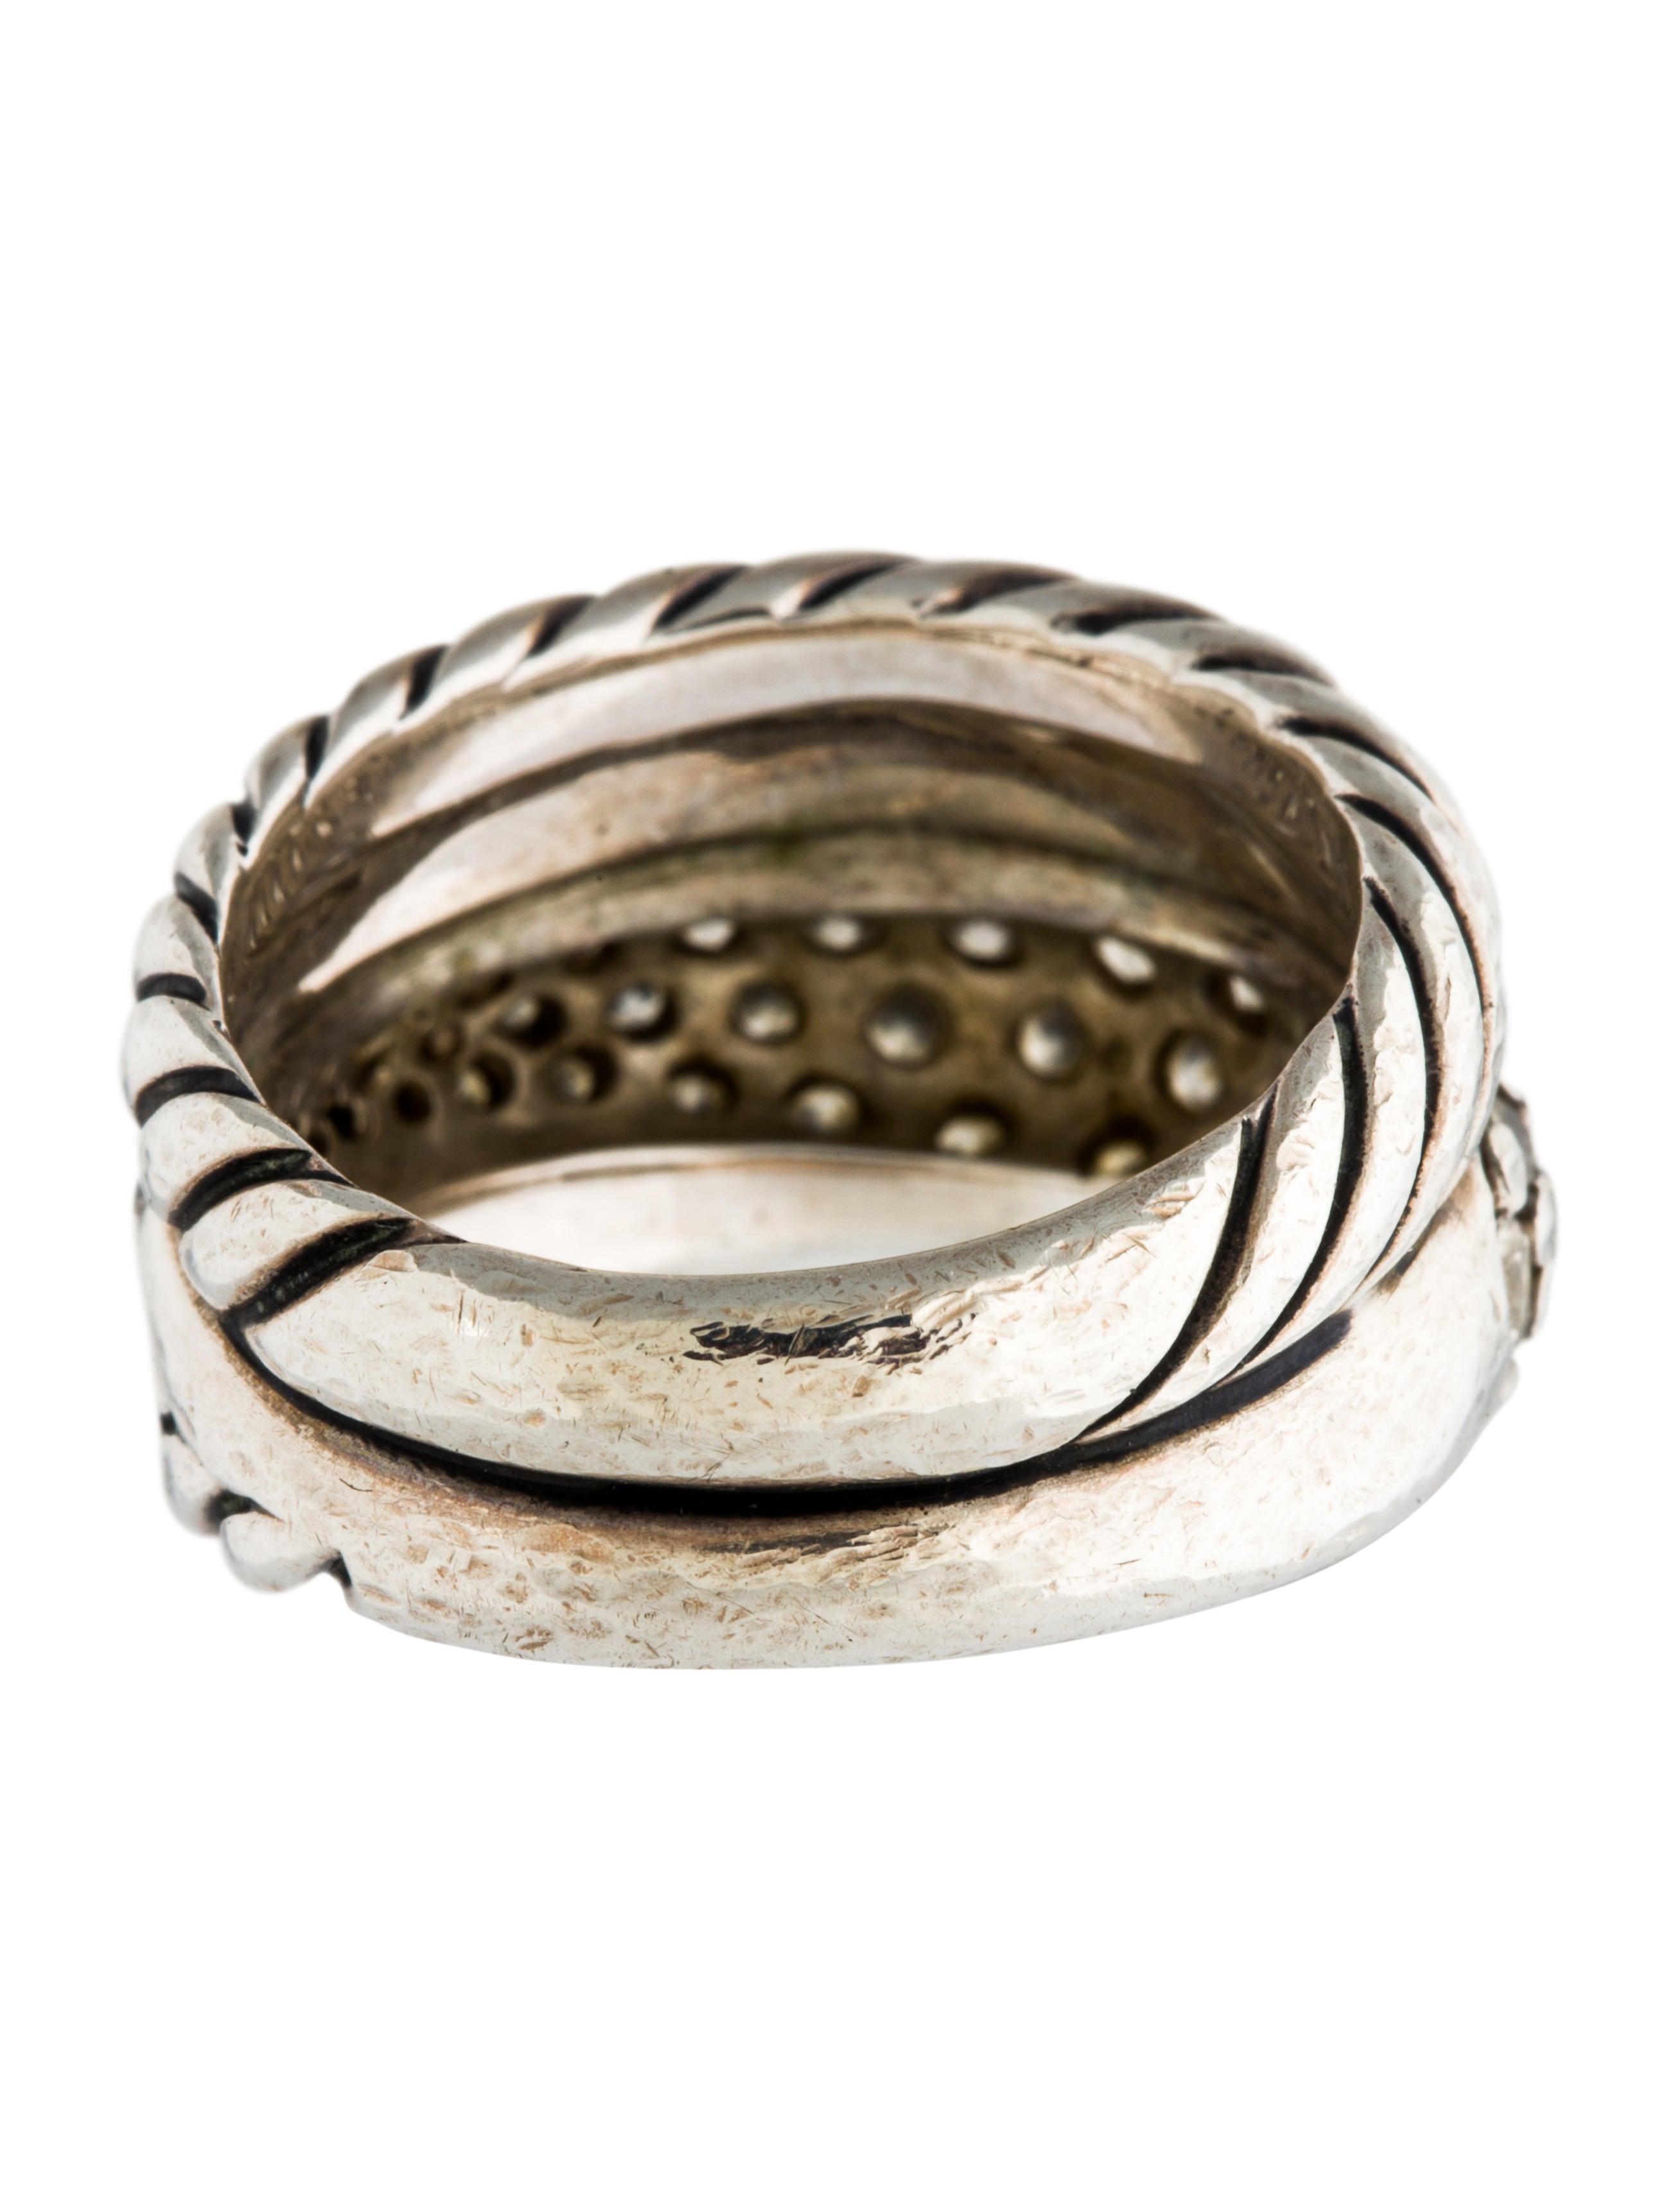 David yurman diamond band ring rings dvy38805 the for David yurman inspired jewelry rings